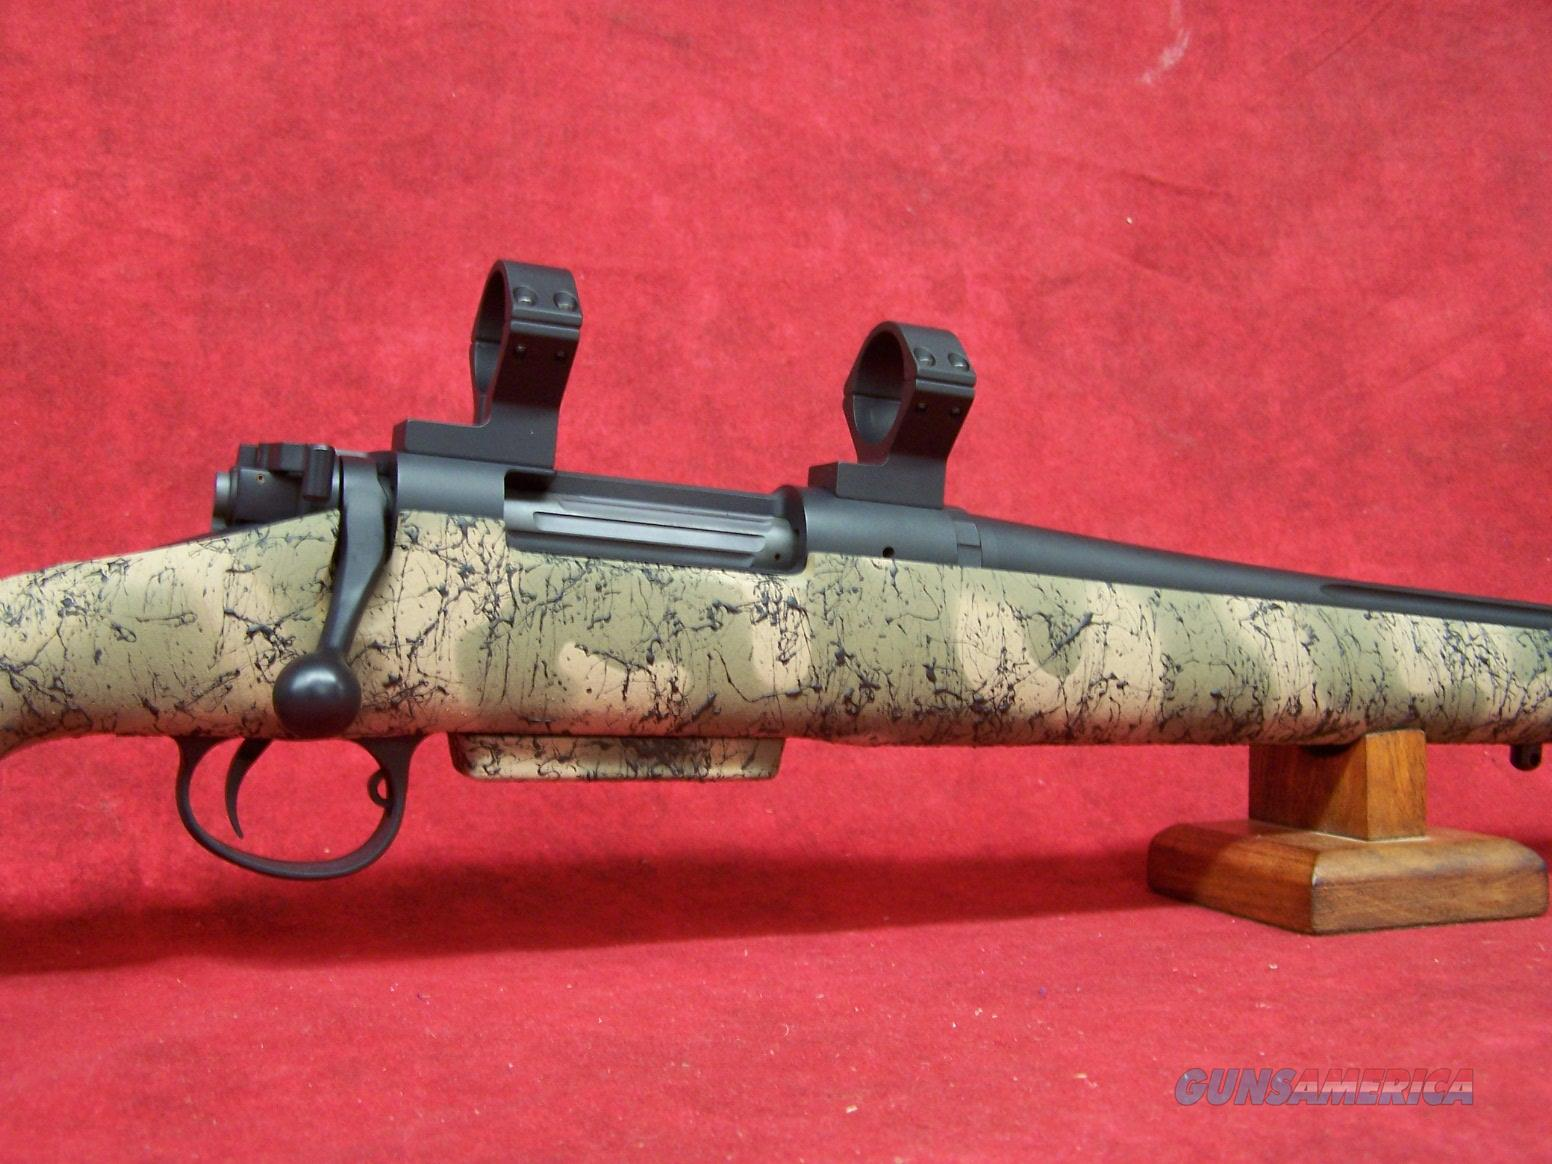 "HS Precision SPL 6.5 Creedmoor Green & Tan Camo stock 22"" Threaded Barrel H-S Precision   Guns > Rifles > HS Precision Rifles"